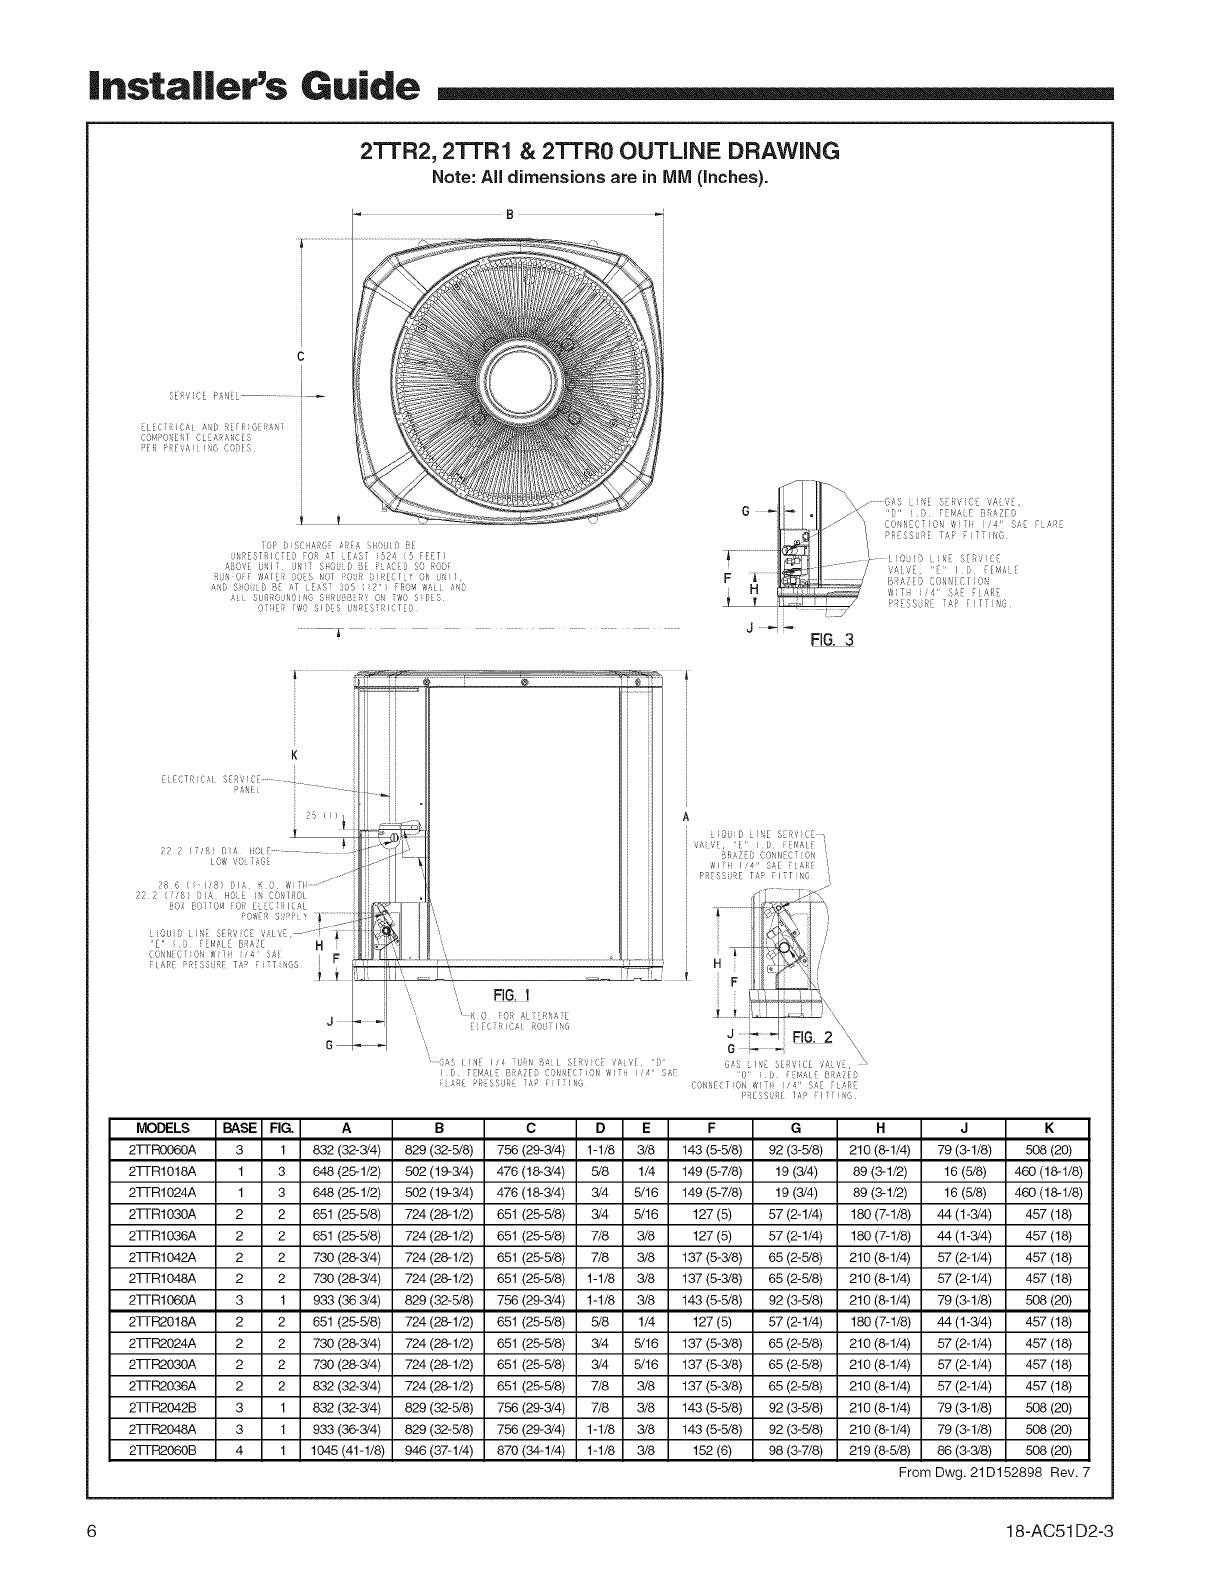 TRANE Air Conditioner/heat Pump(outside Unit) Manual L0903230